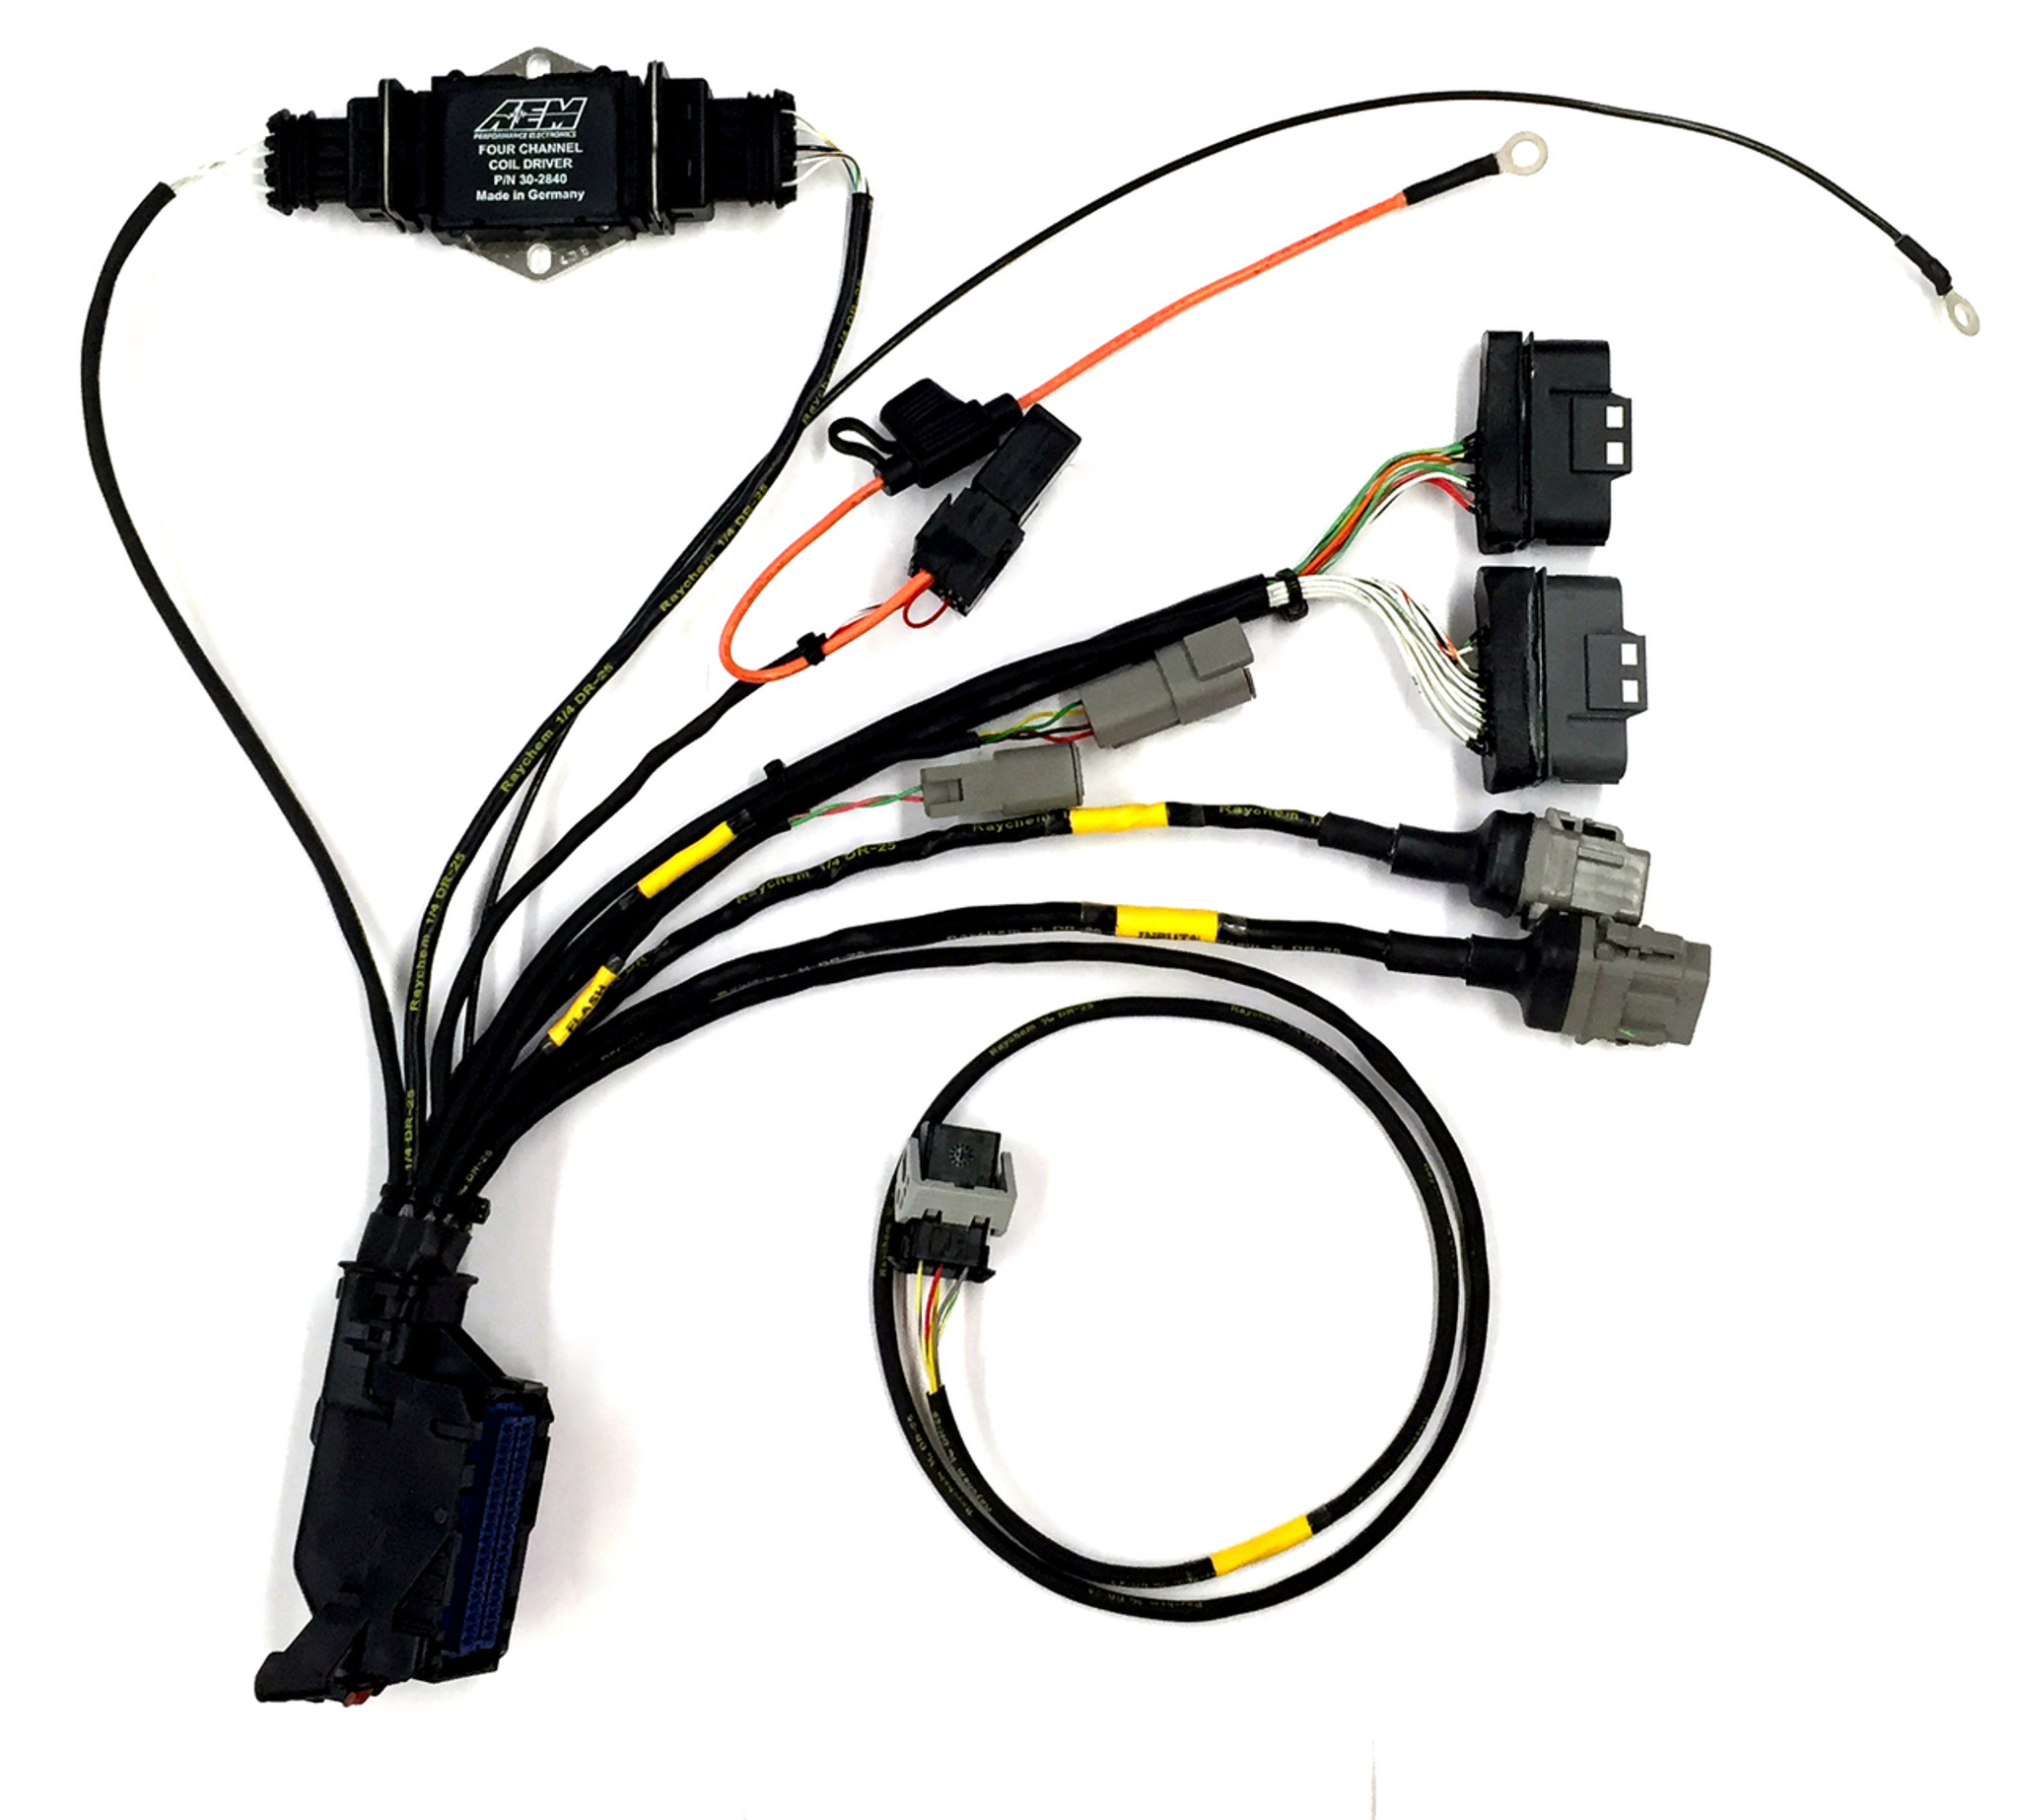 small resolution of infinity ecu plug and play wiring harness shop htp aem fic wiring harness aem wiring harness